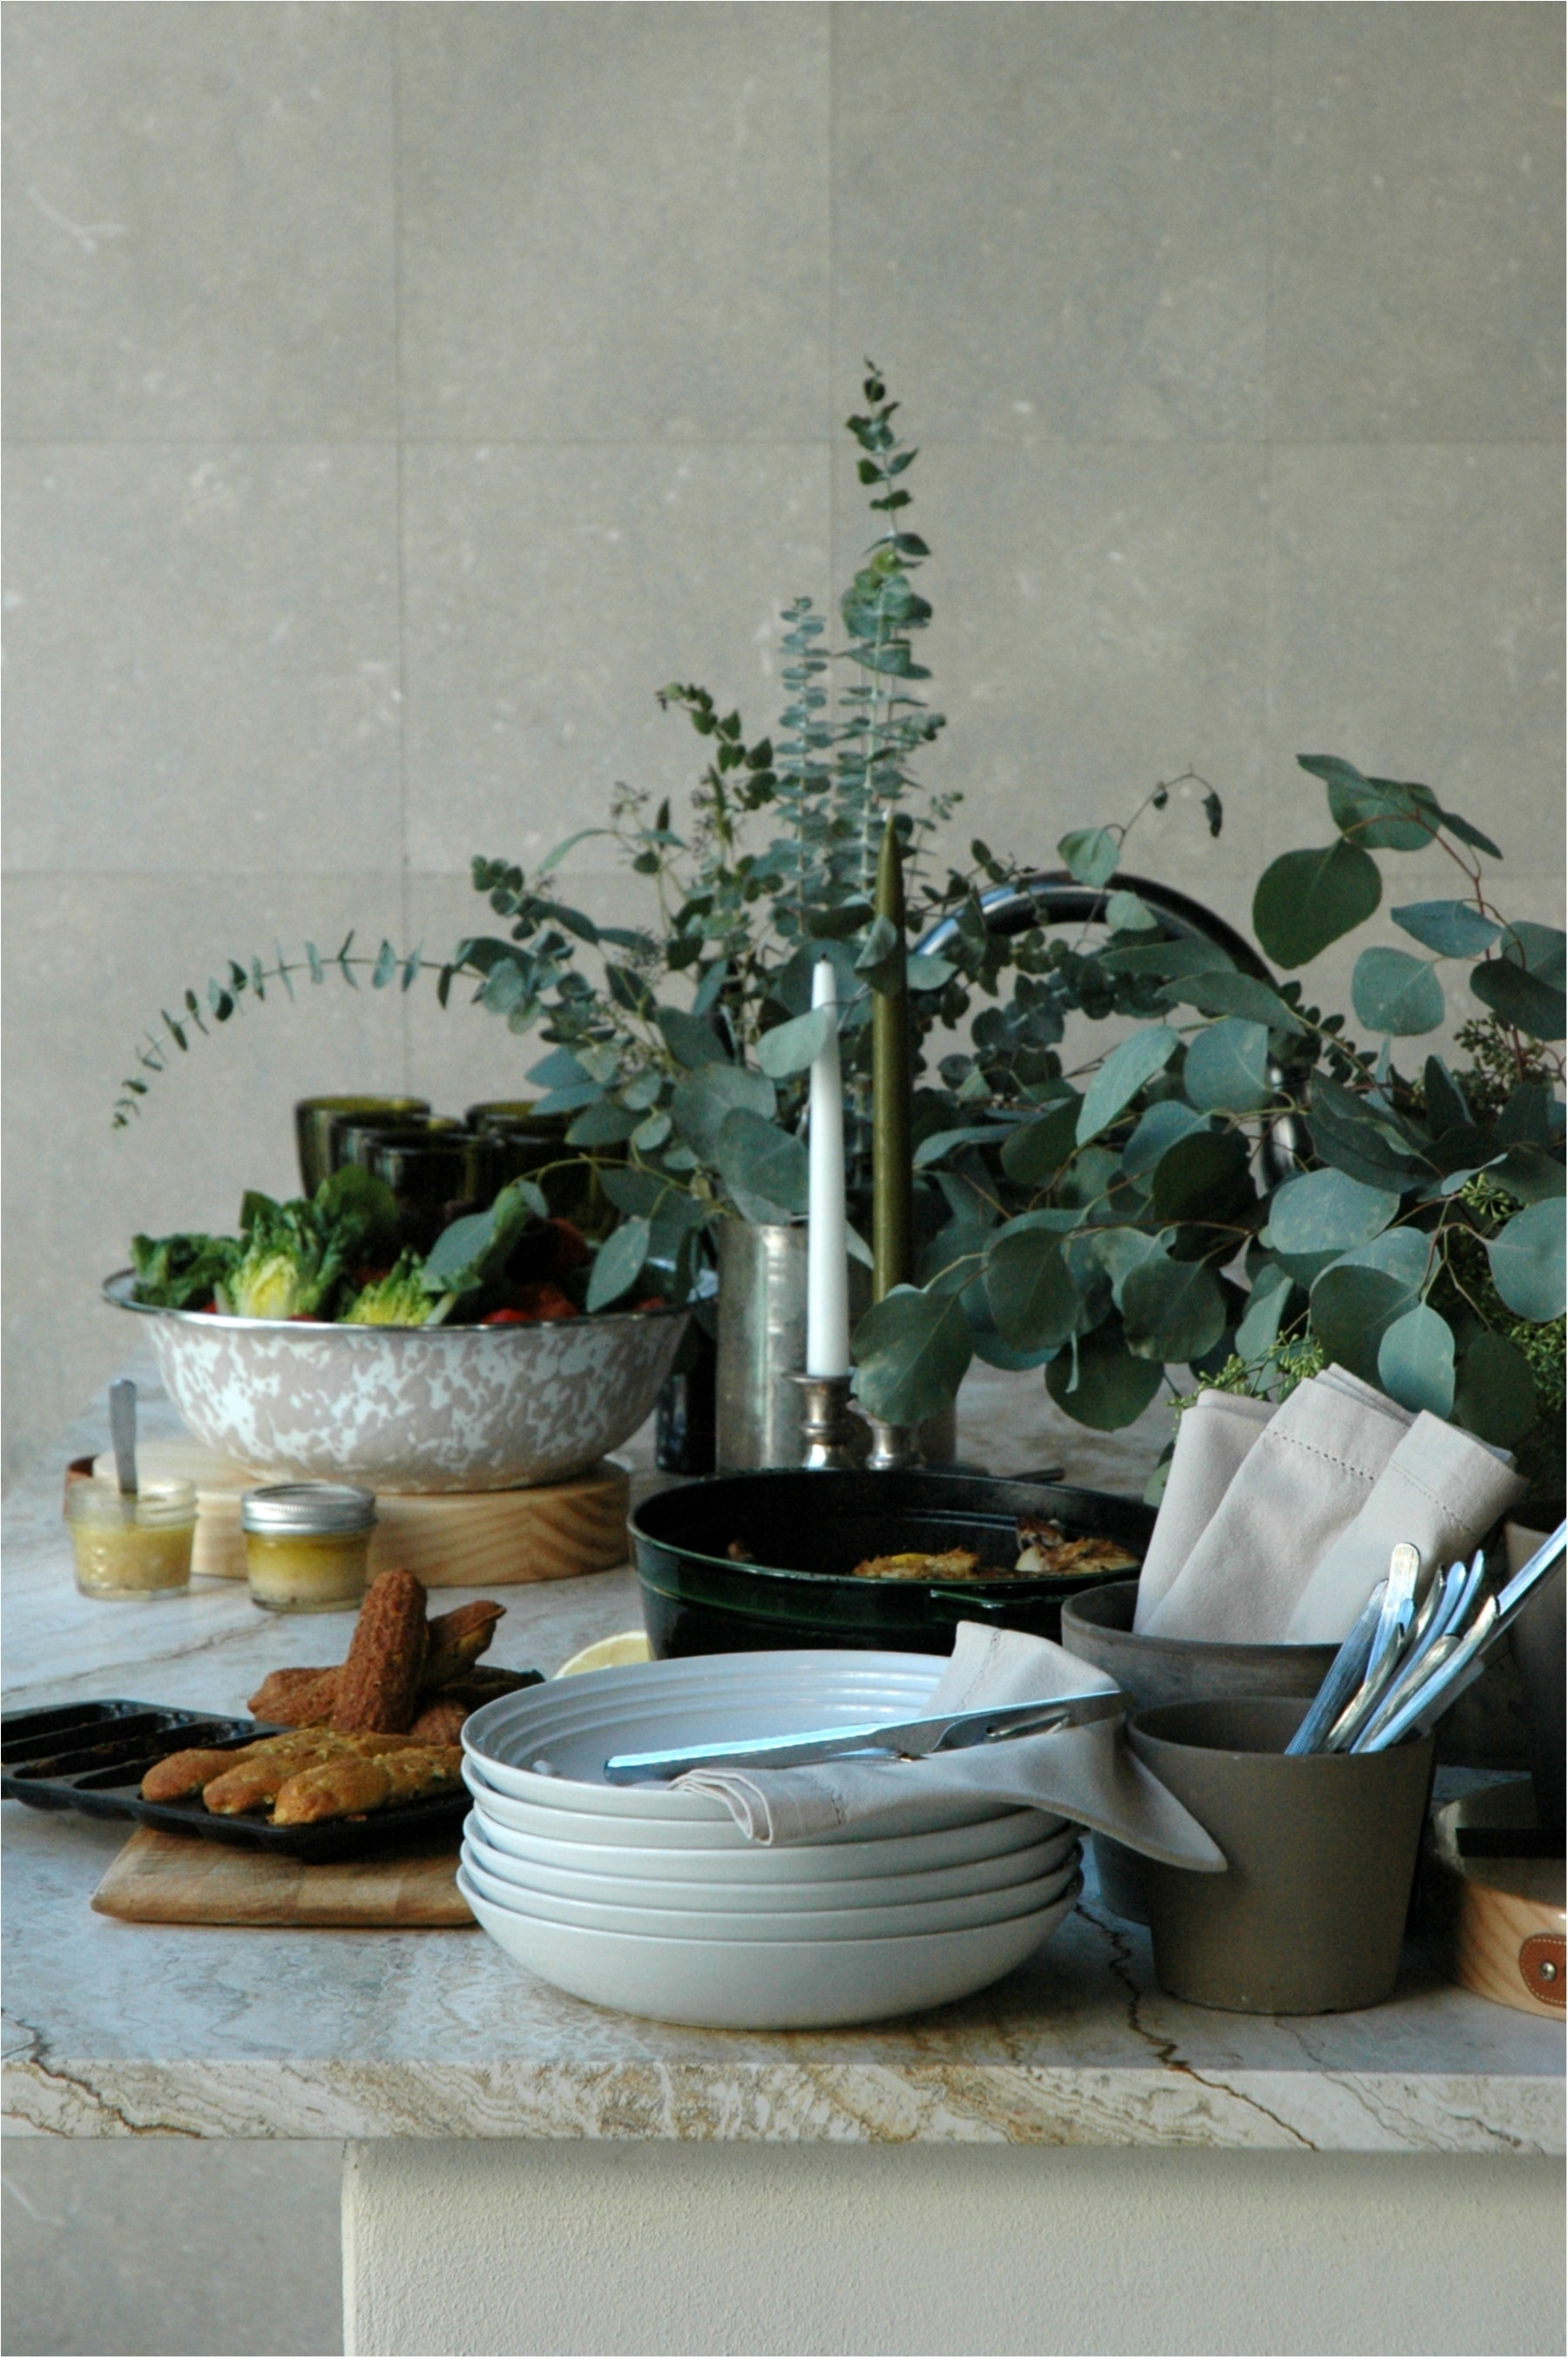 KF-IHA-Potluck-Dinner-Staub -LeCreuset -HamptonForge -LodgeCastIron -Architec -1